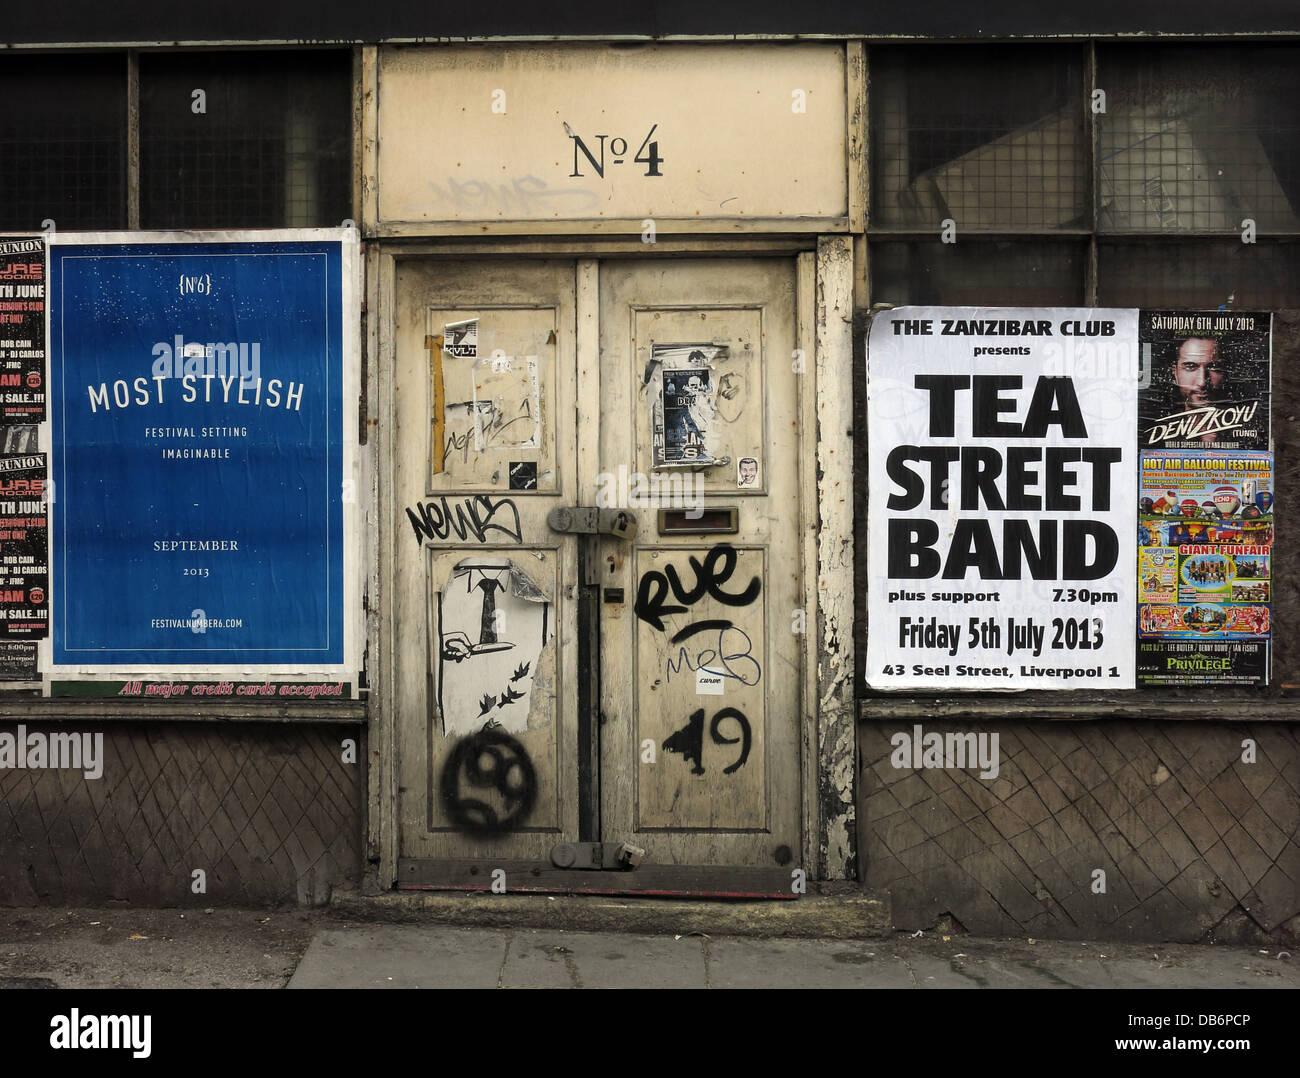 GoTonySmith,@HotpixUK,Tony,Smith,UK,GB,Great,Britain,United,Kingdom,English,British,England,problem,with,problem with,issue with,Buy Pictures of,Buy Images Of,Images of,Stock Images,Tony Smith,United Kingdom,Great Britain,British Isles,door,locked,building,No4,Merseyside,old,doorway,cream,Tea Street Band,Rue,Zanzibar,Zanzibar Club,dirty,unloved